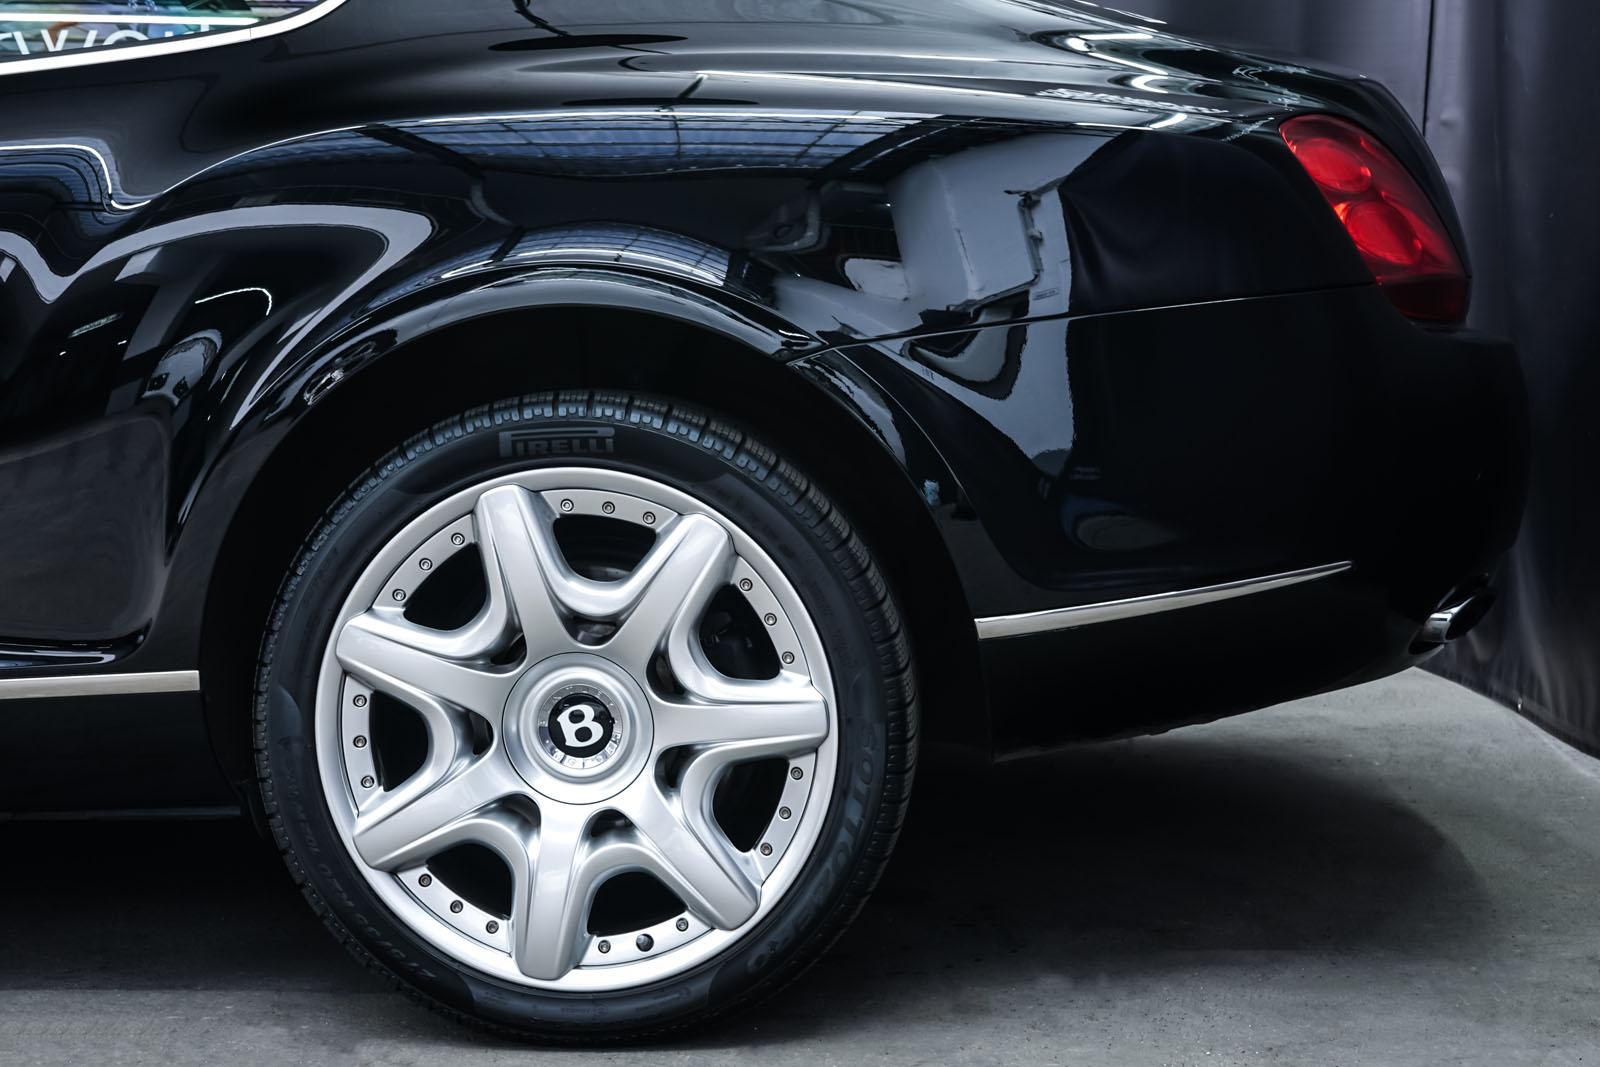 Bentley_Continental_GT_Schwarz_Beige_BEN-1159_4_w